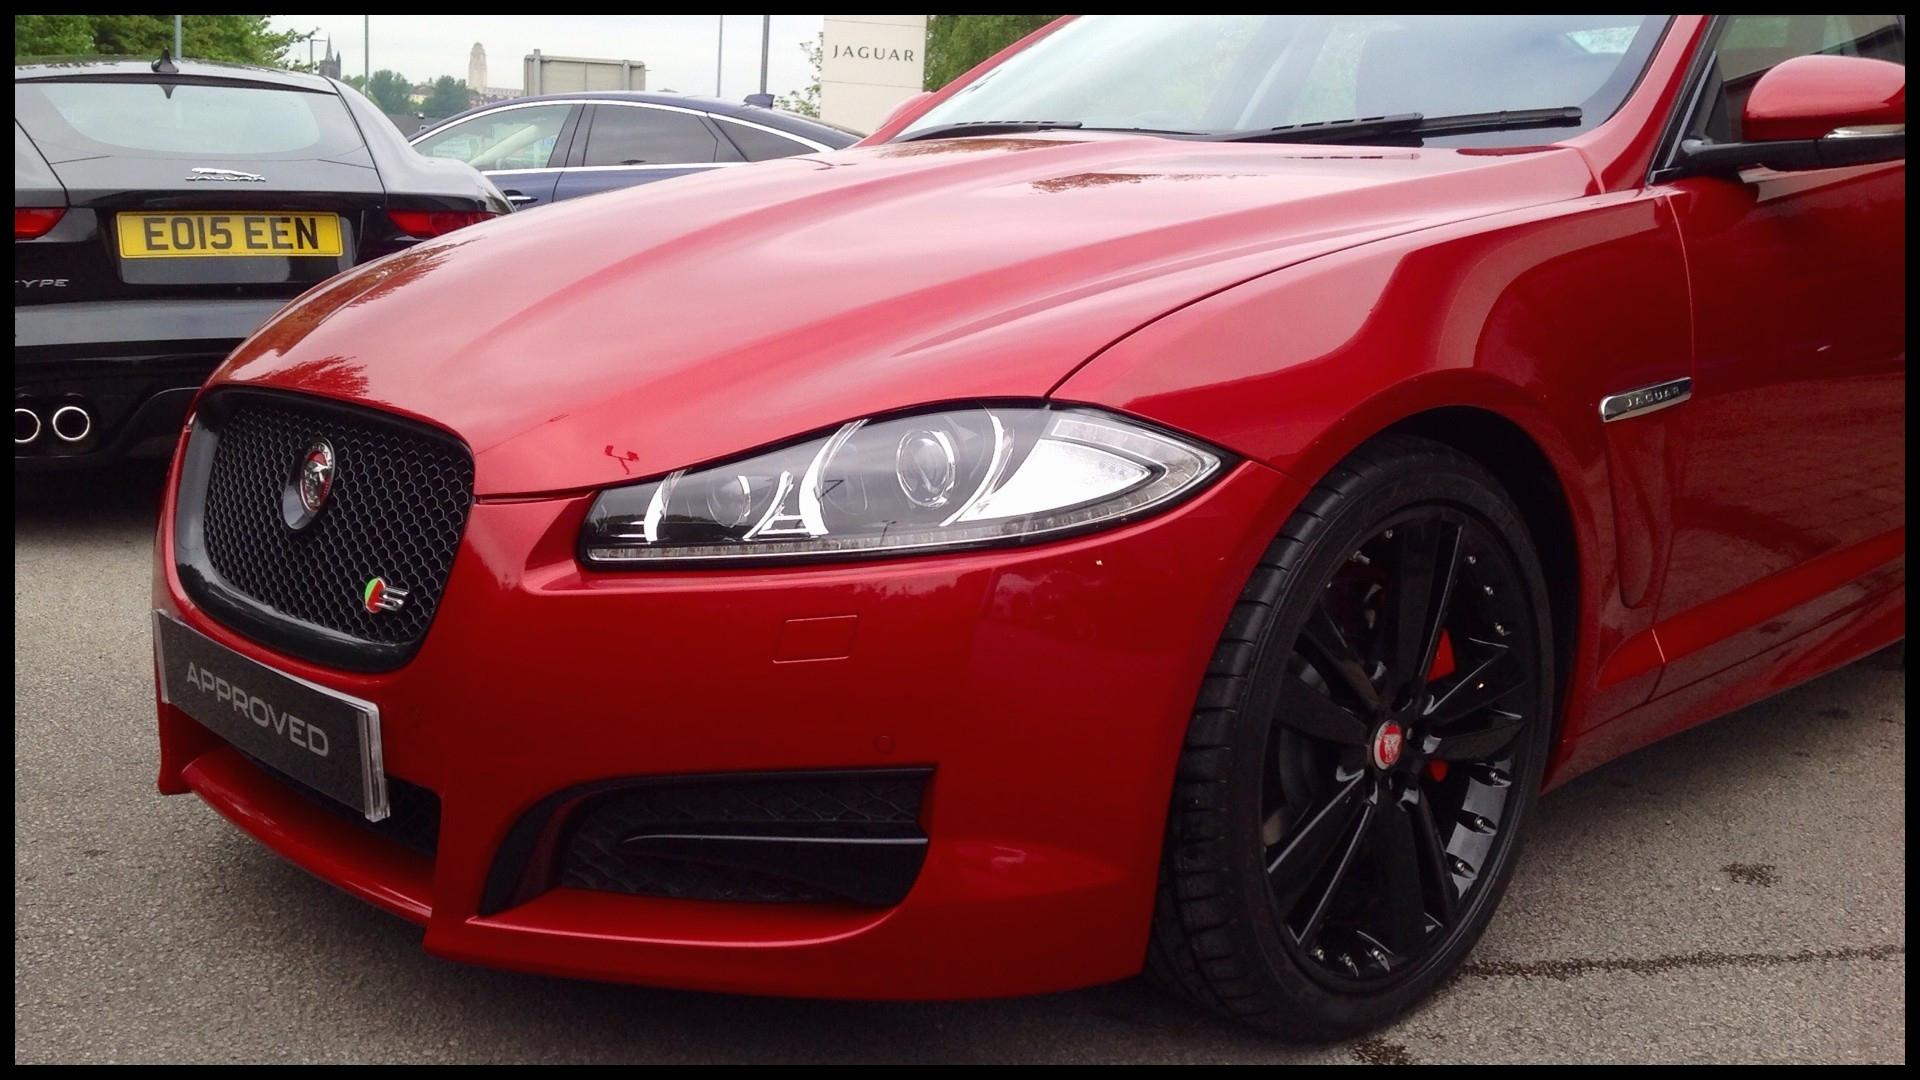 Used Audi Car Fresh 2015 Jaguar Xf Best Neuer Jaguar Xf 2 0d Mit Leichtbau Gegen